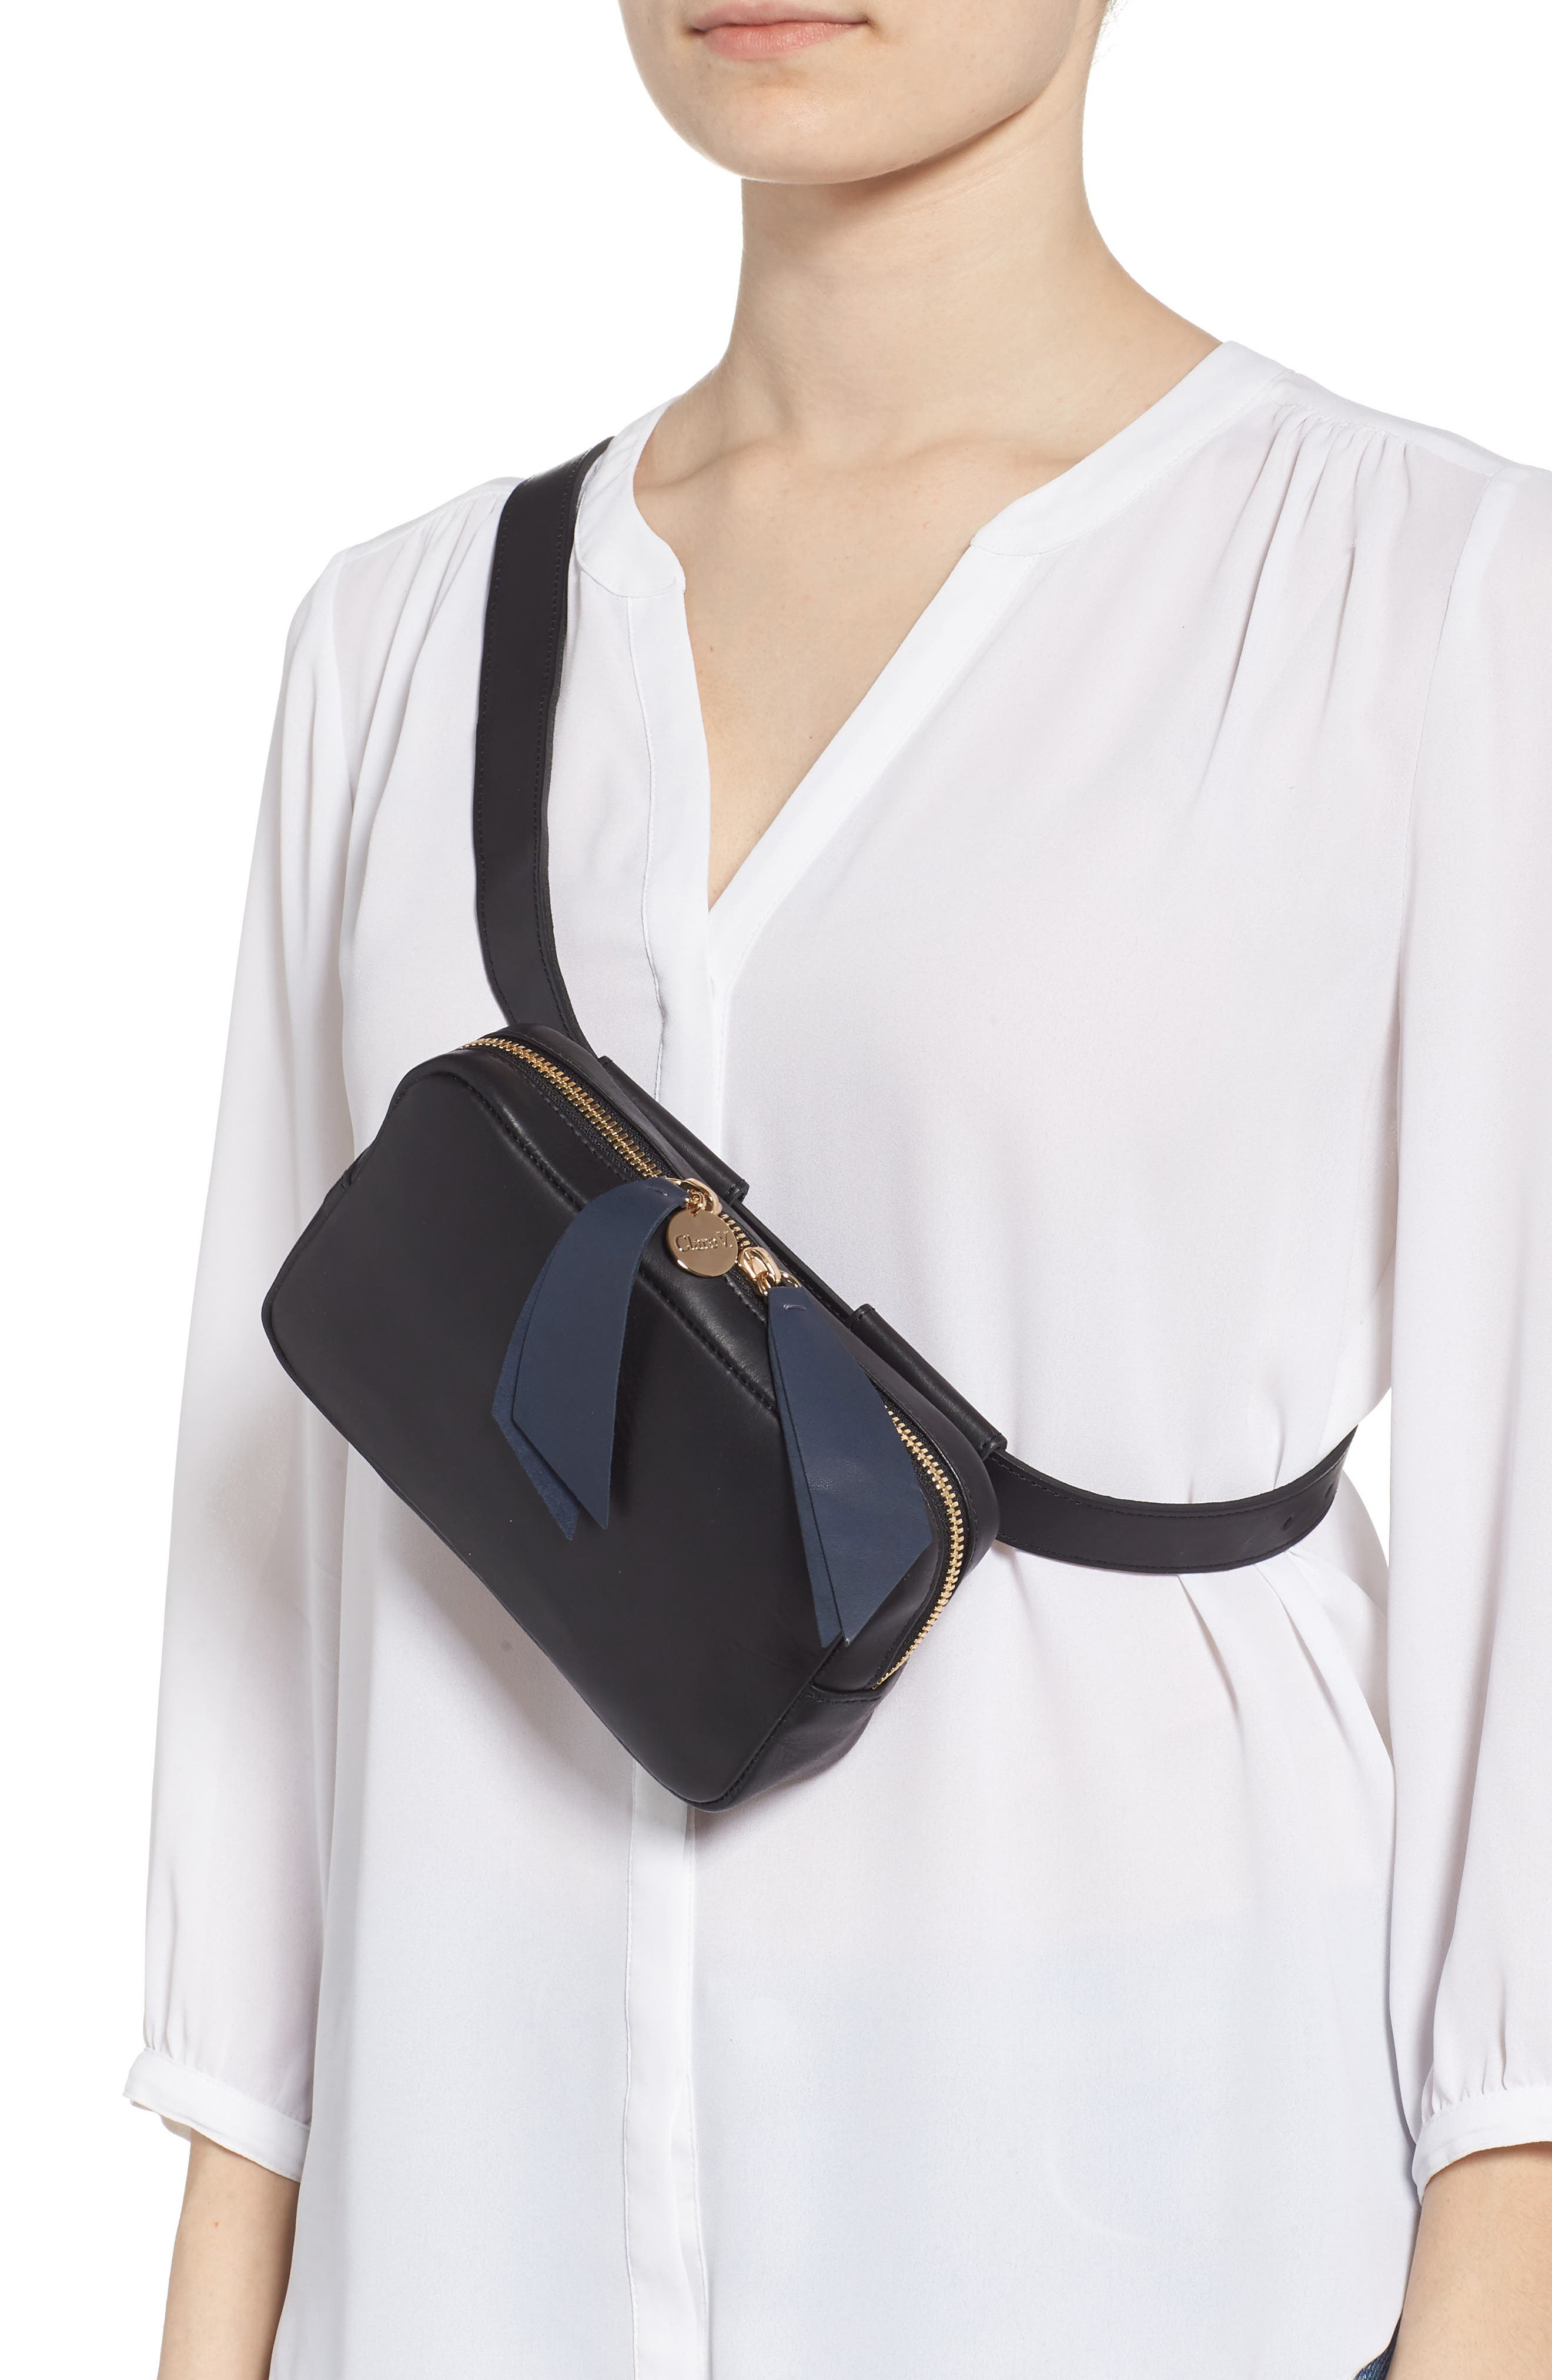 Le Belt Leather Convertible Crossbody Bag,                             Alternate thumbnail 3, color,                             BLACK VEGAN